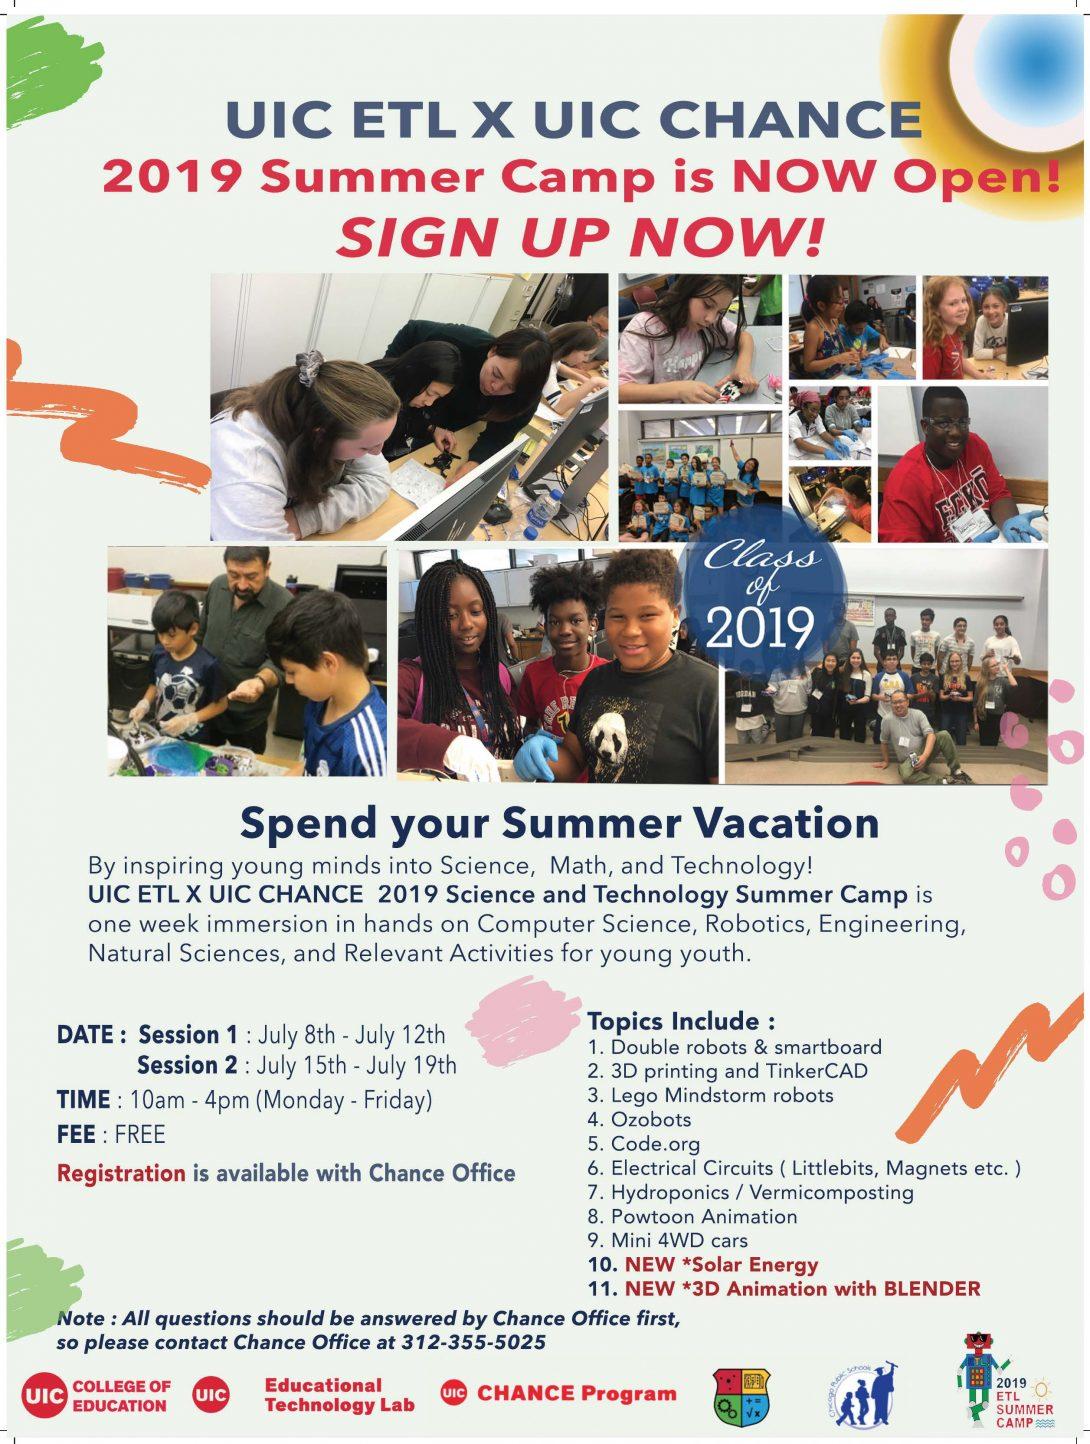 ETL Summer Camp 2019